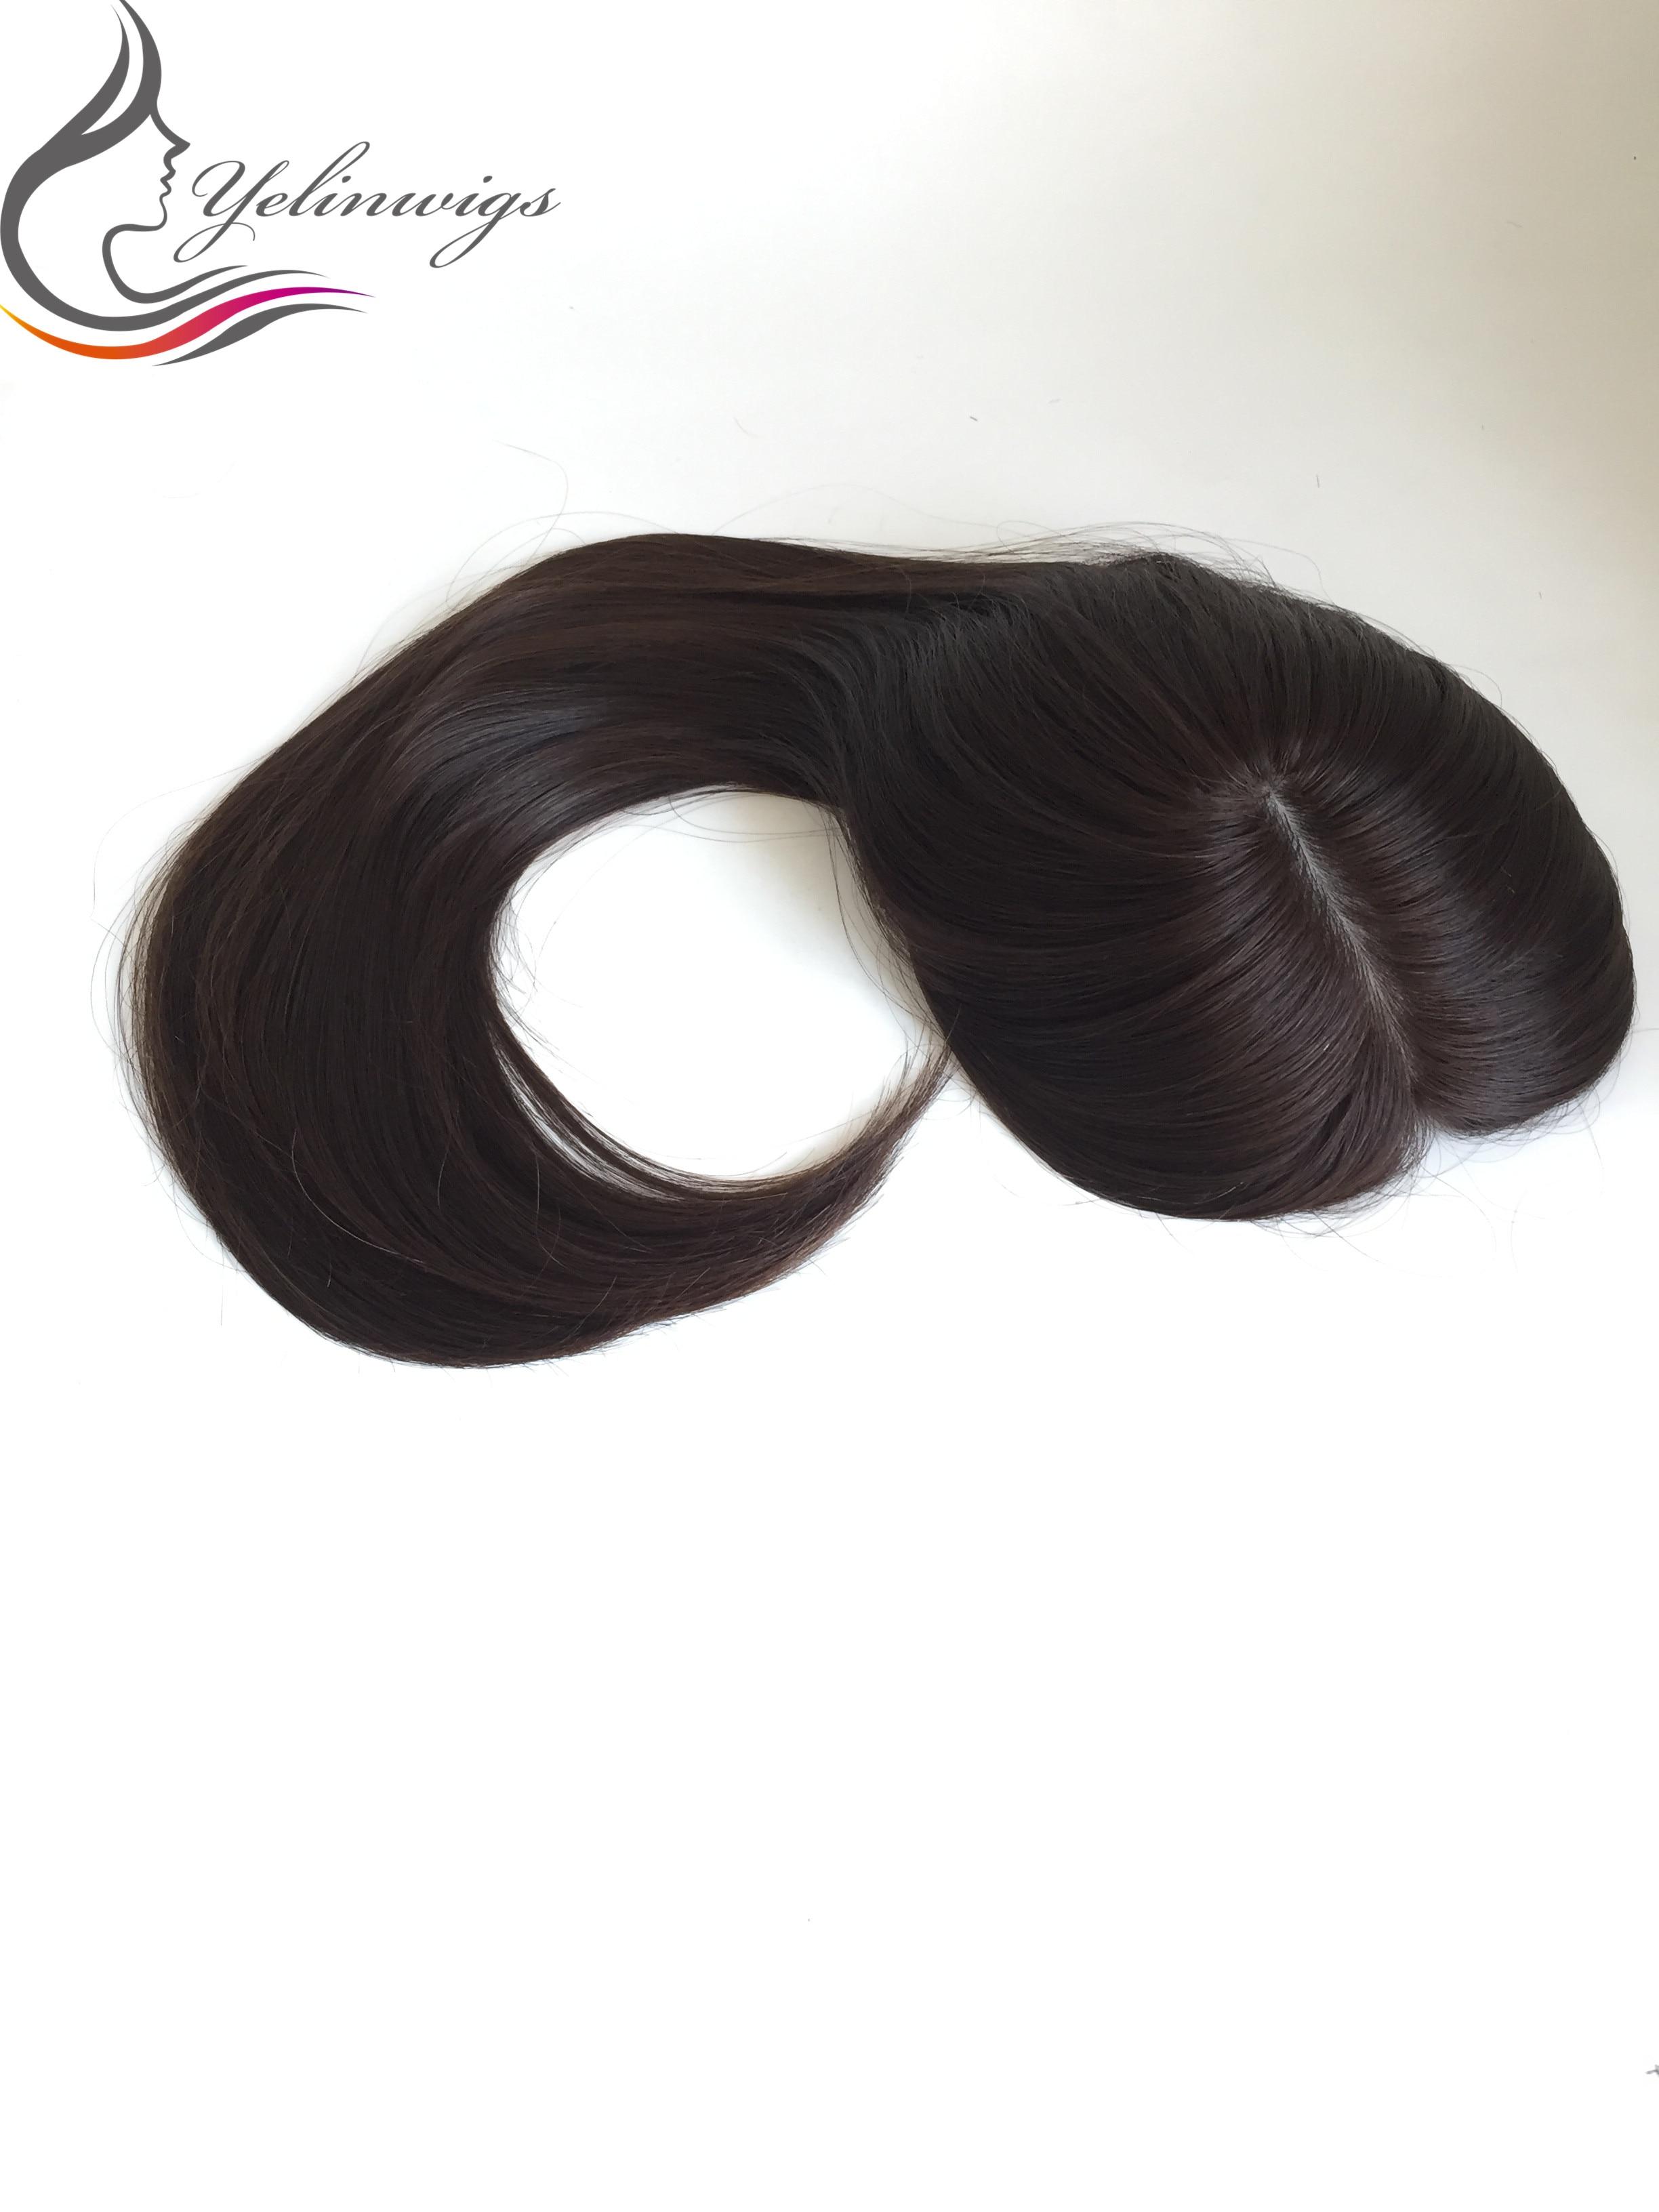 Natural Black Color Silk Top European Virgin Hair Toppers Kippah Fall For Jewish Women Hair Pieces